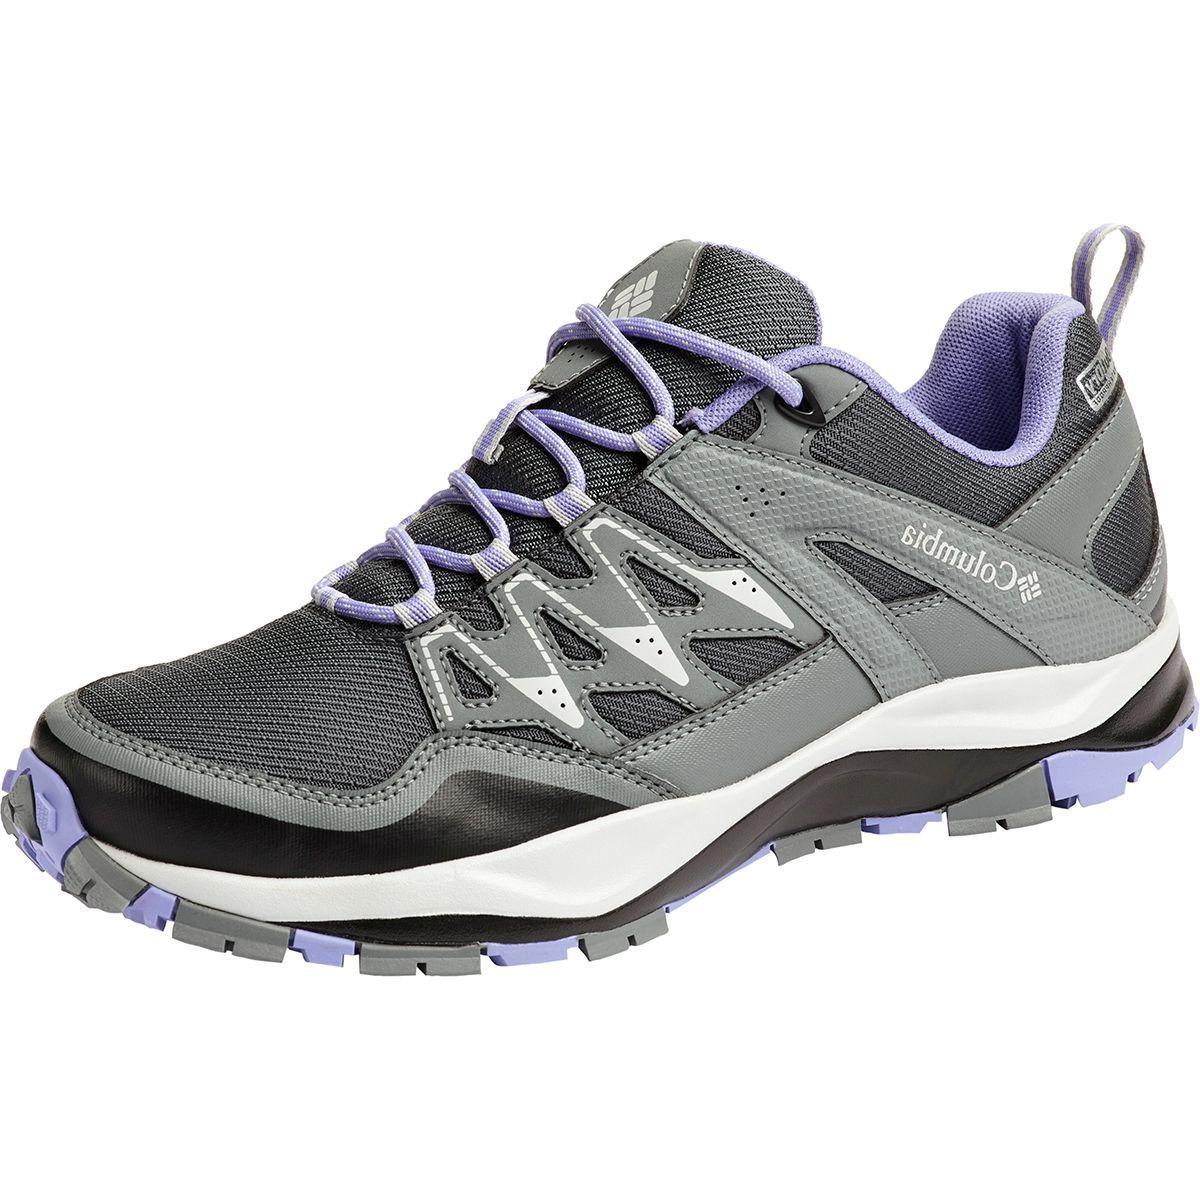 Columbia Wayfinder Outdry Hiking Shoe - Women's